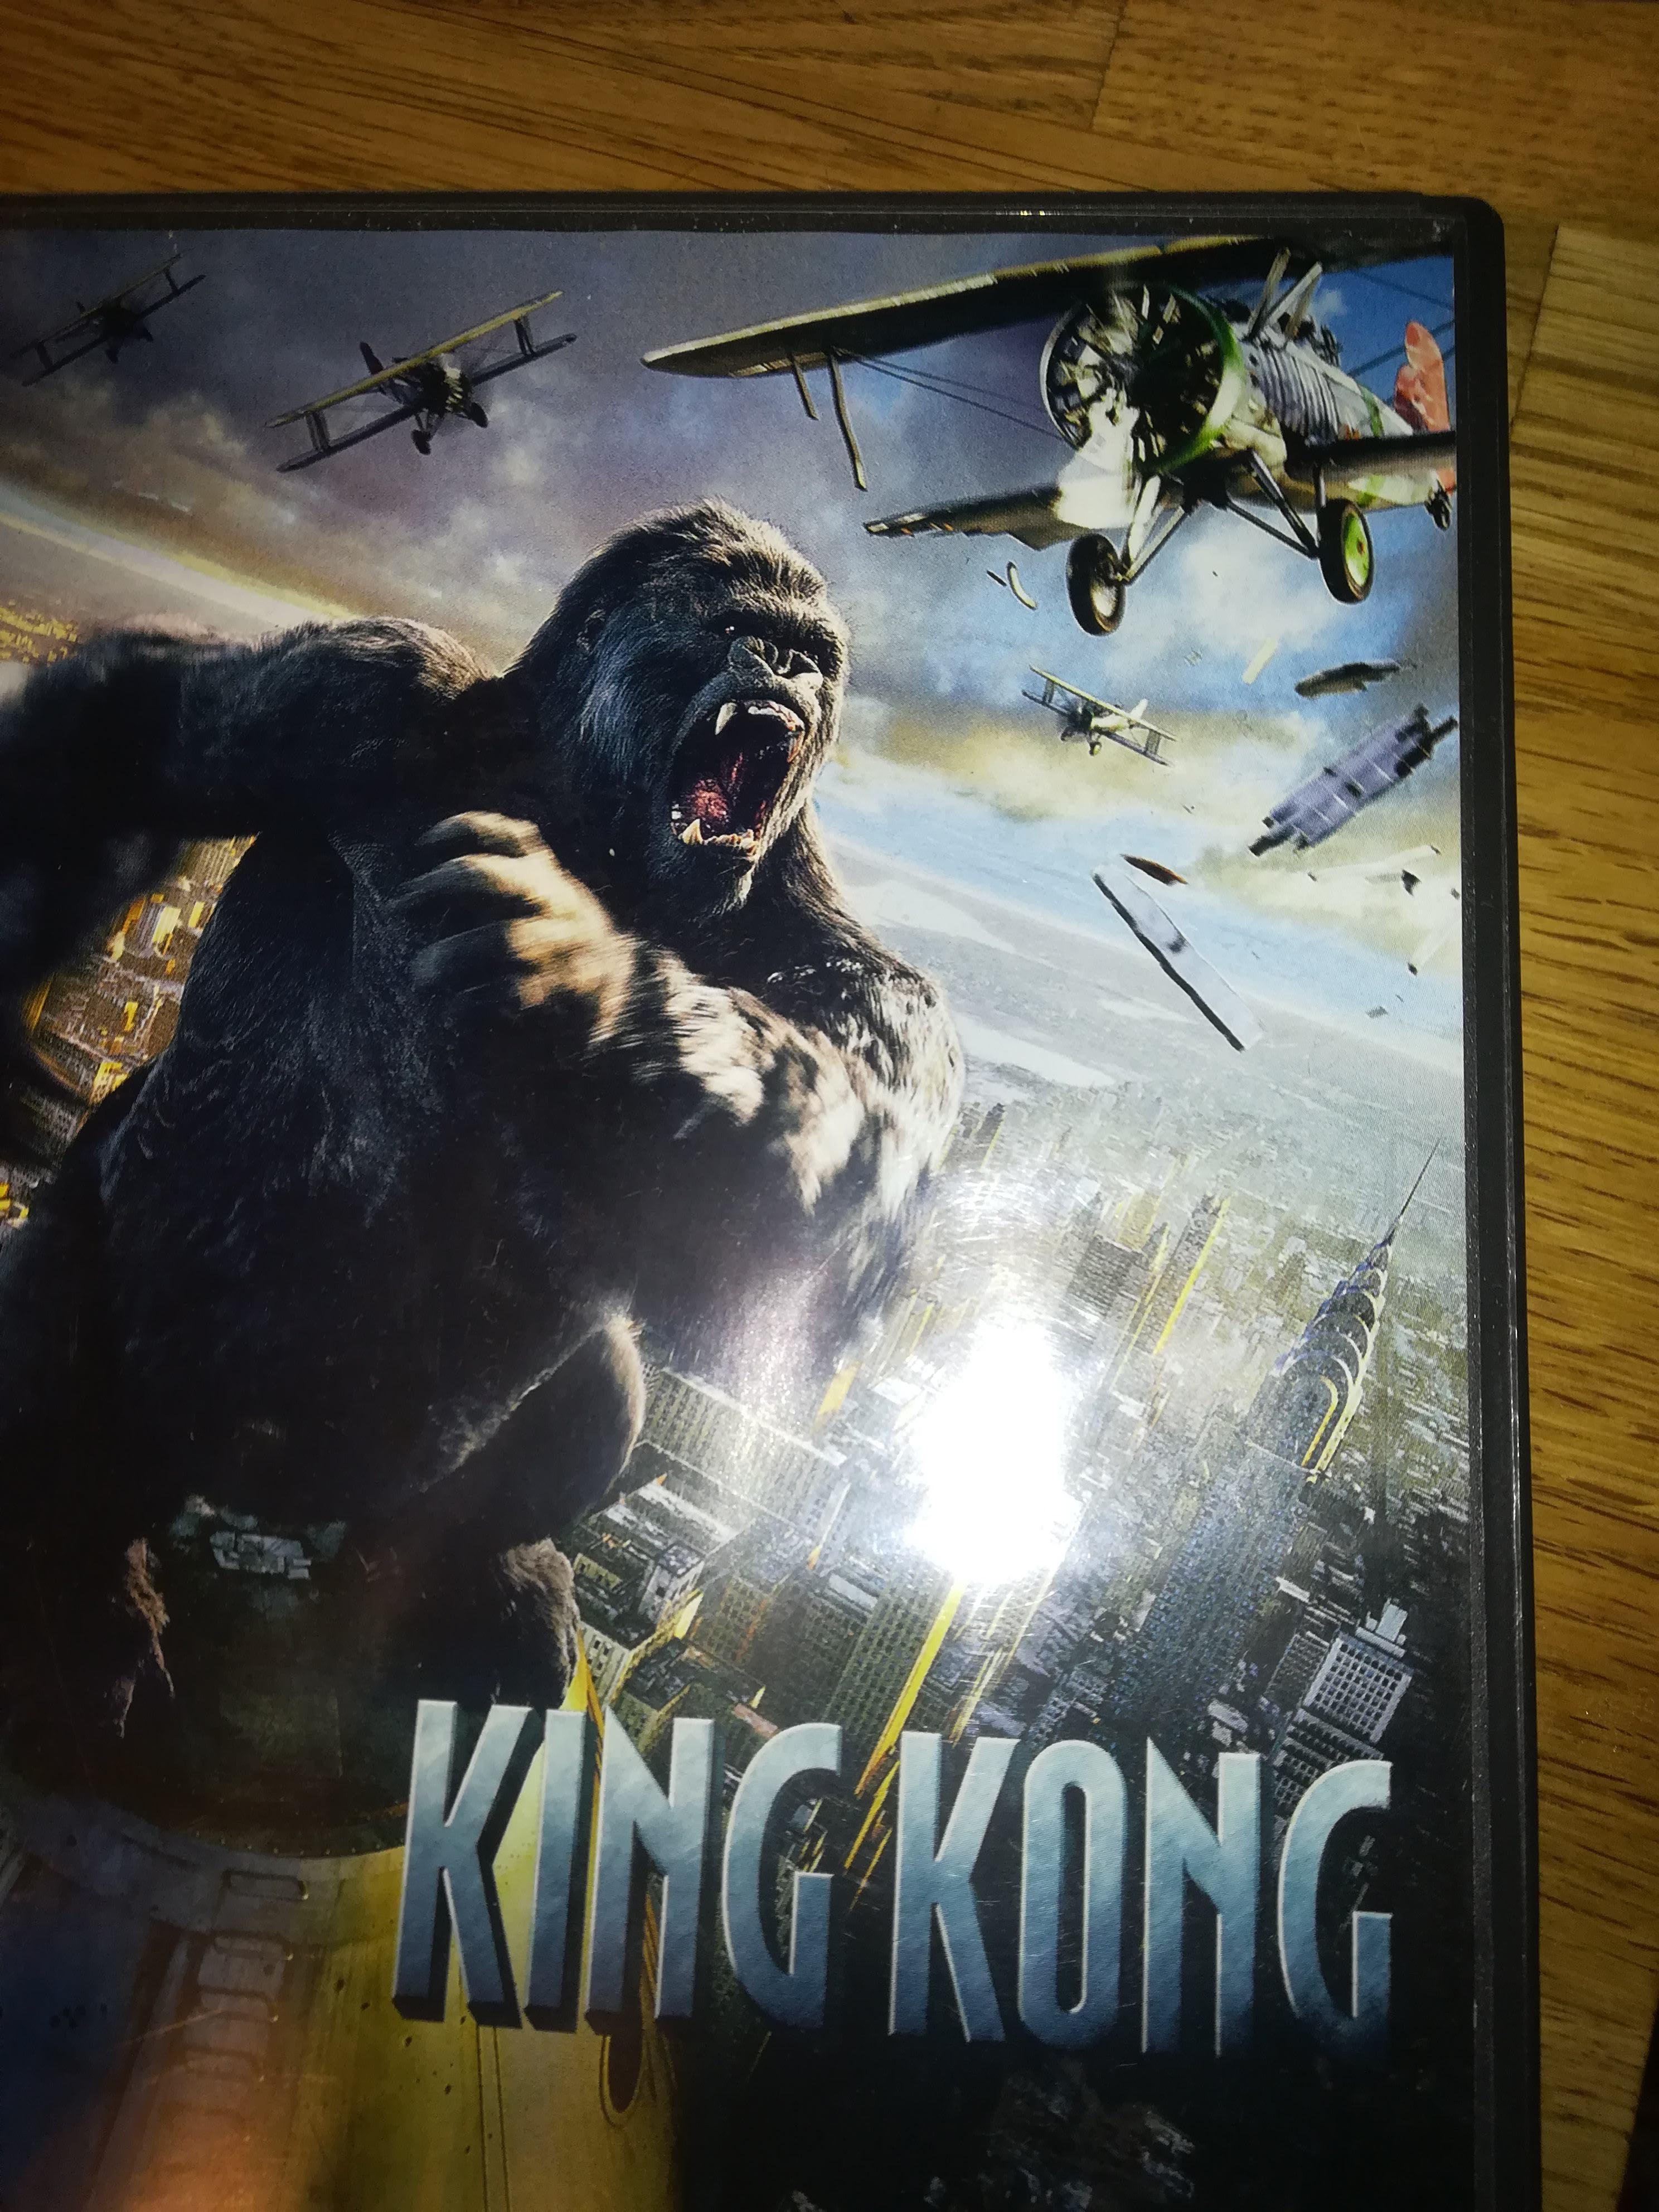 troc de troc reserve dvd king kong image 0